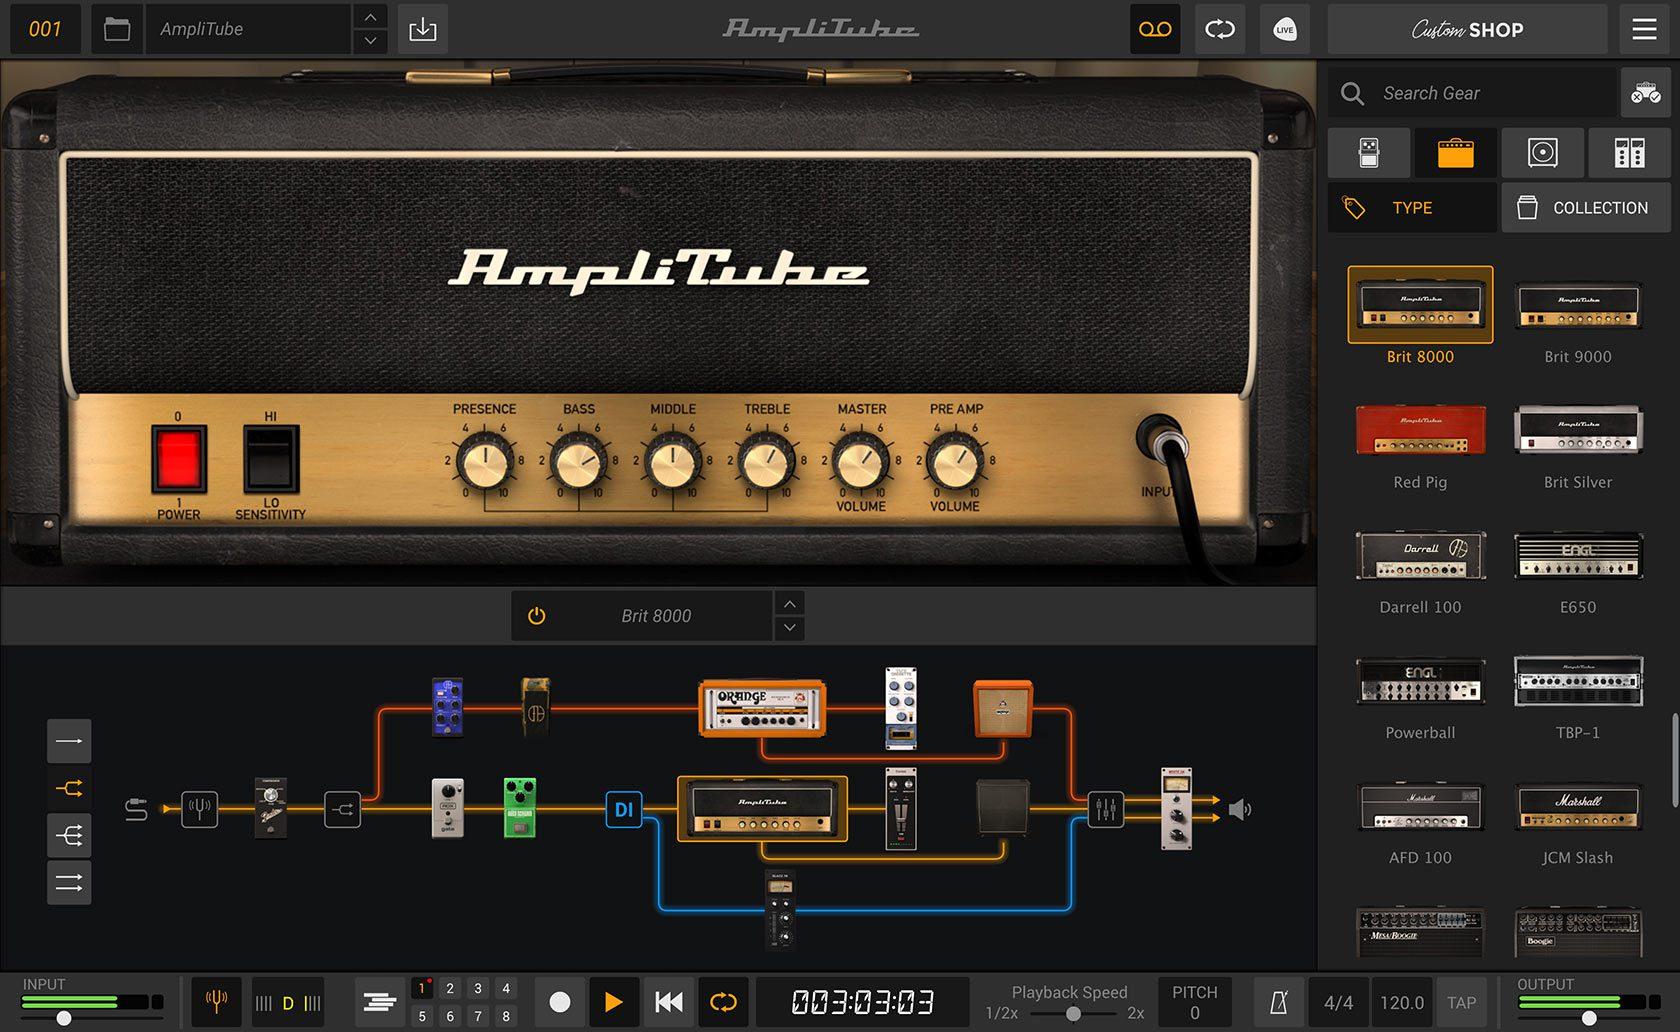 IK Multimedia Amplitube 5 Amp